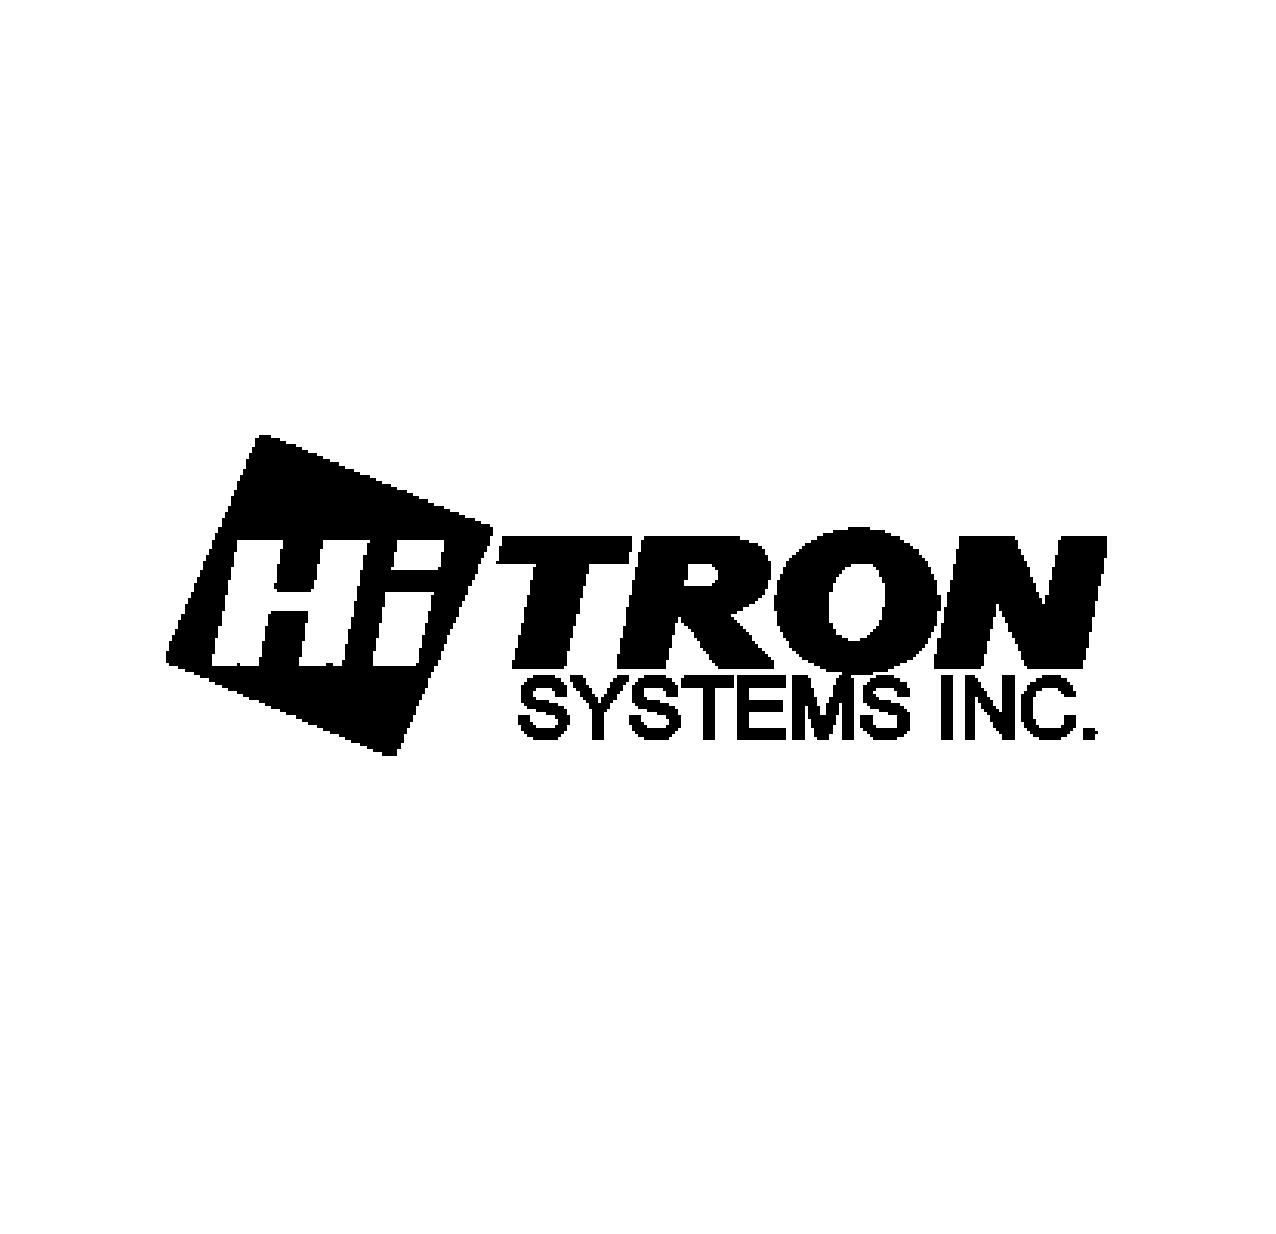 HITRON-1-02